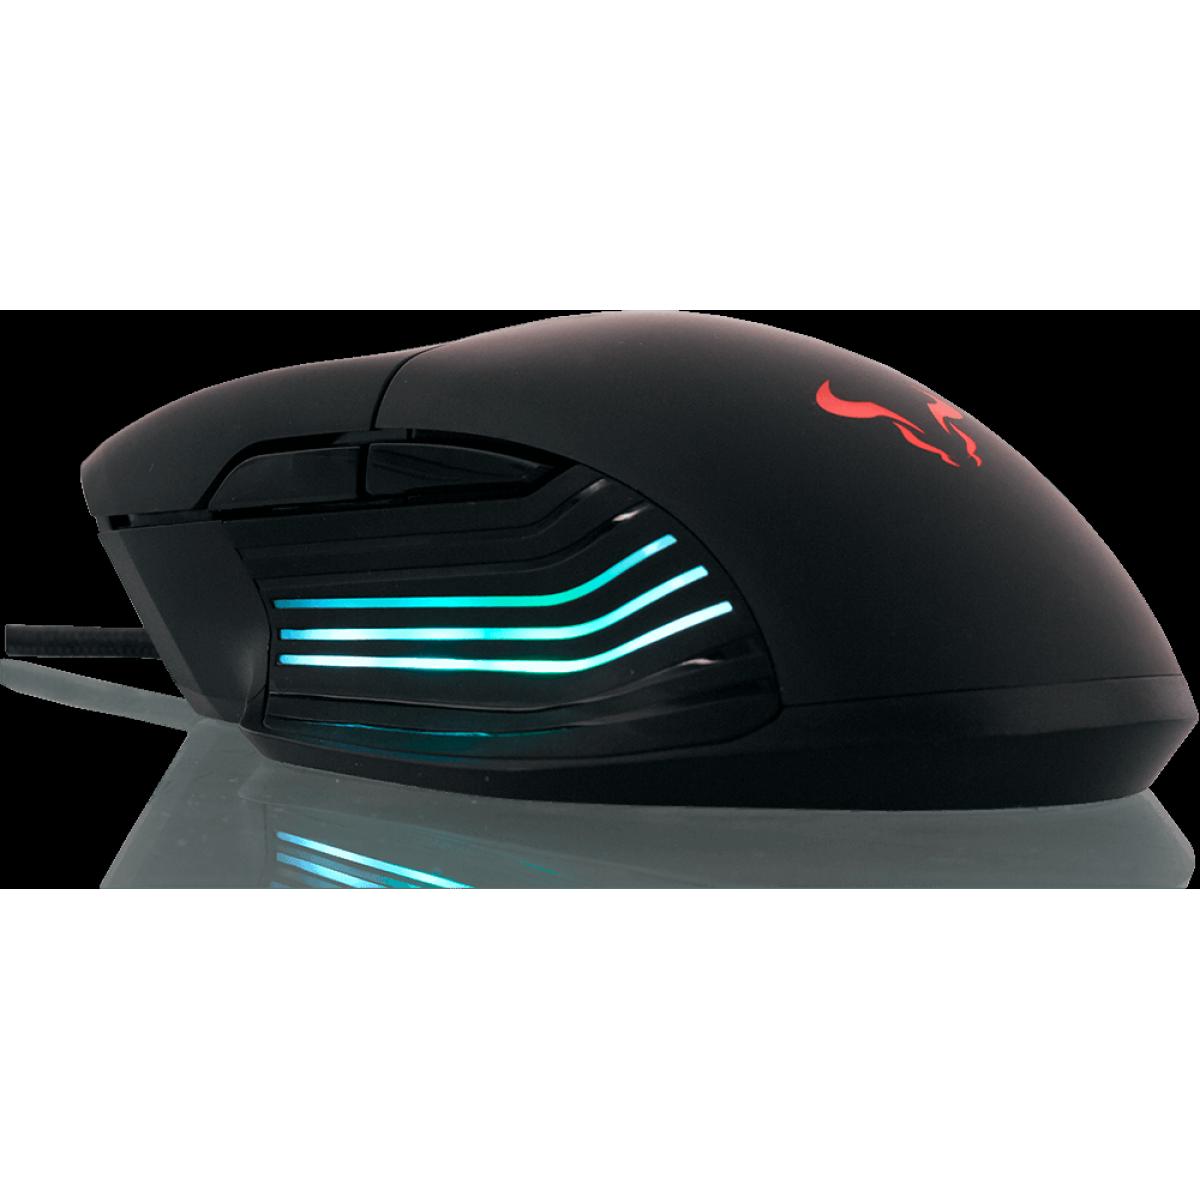 Mouse Gamer Riotoro Nadix RGB, 10000 DPI, 7 Botões Programáveis, Black